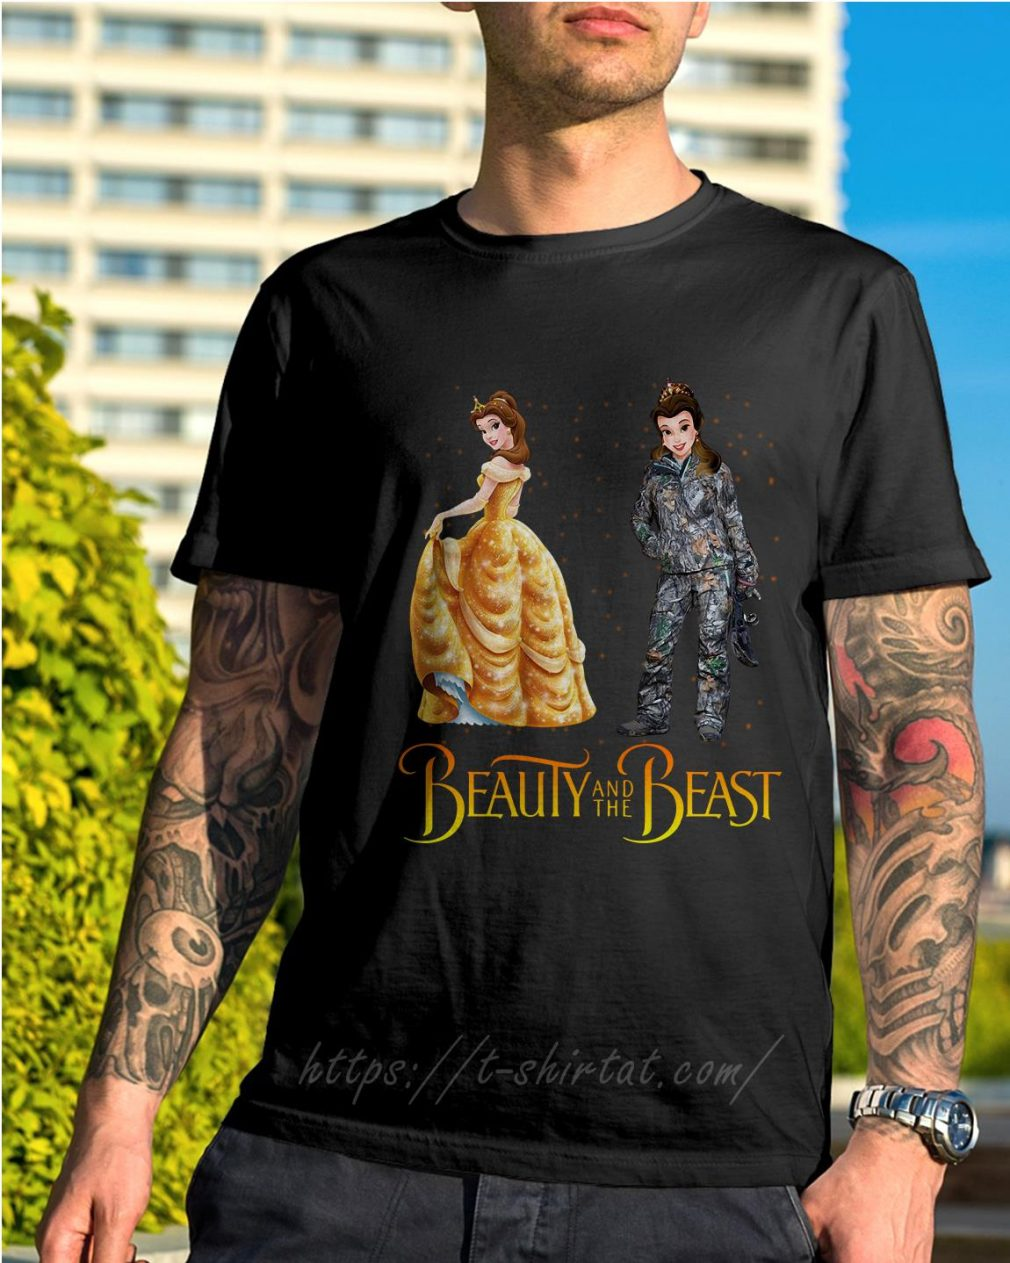 Bella Beauty and the Beast astronaut shirt